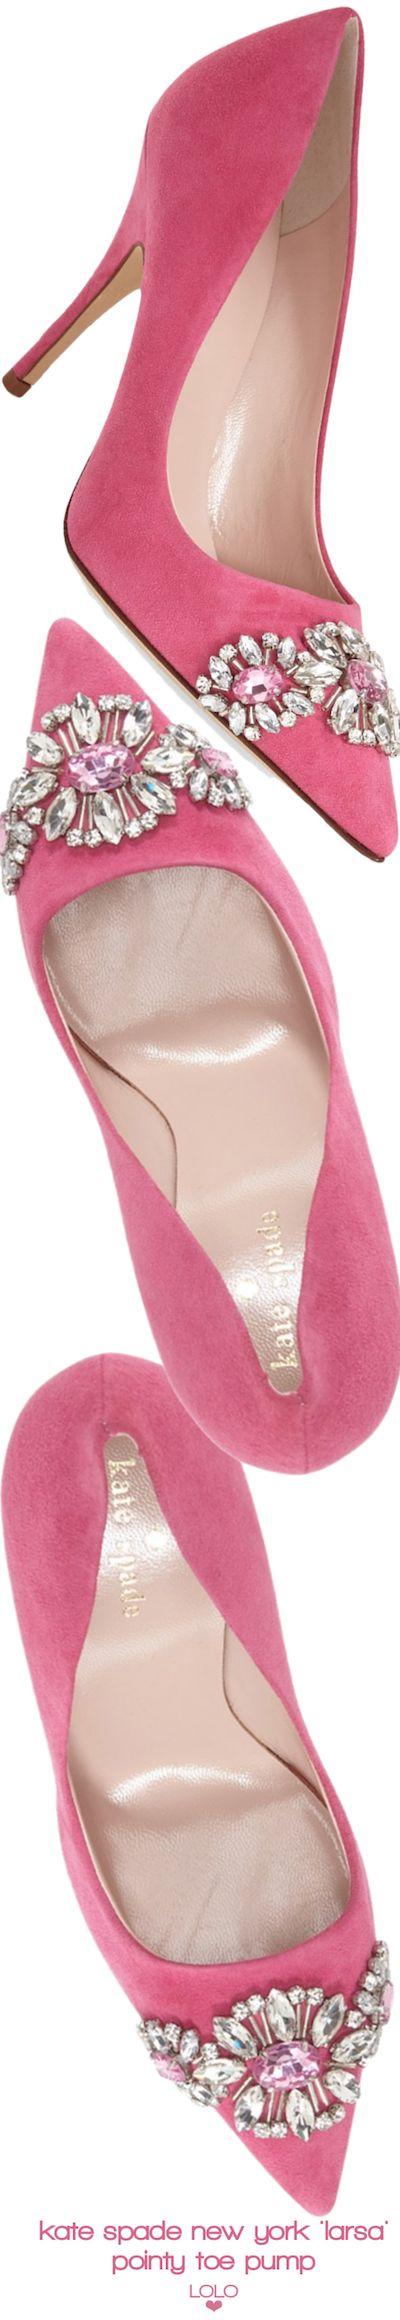 kate spade new york 'larsa' pointy toe pump | LOLO❤︎